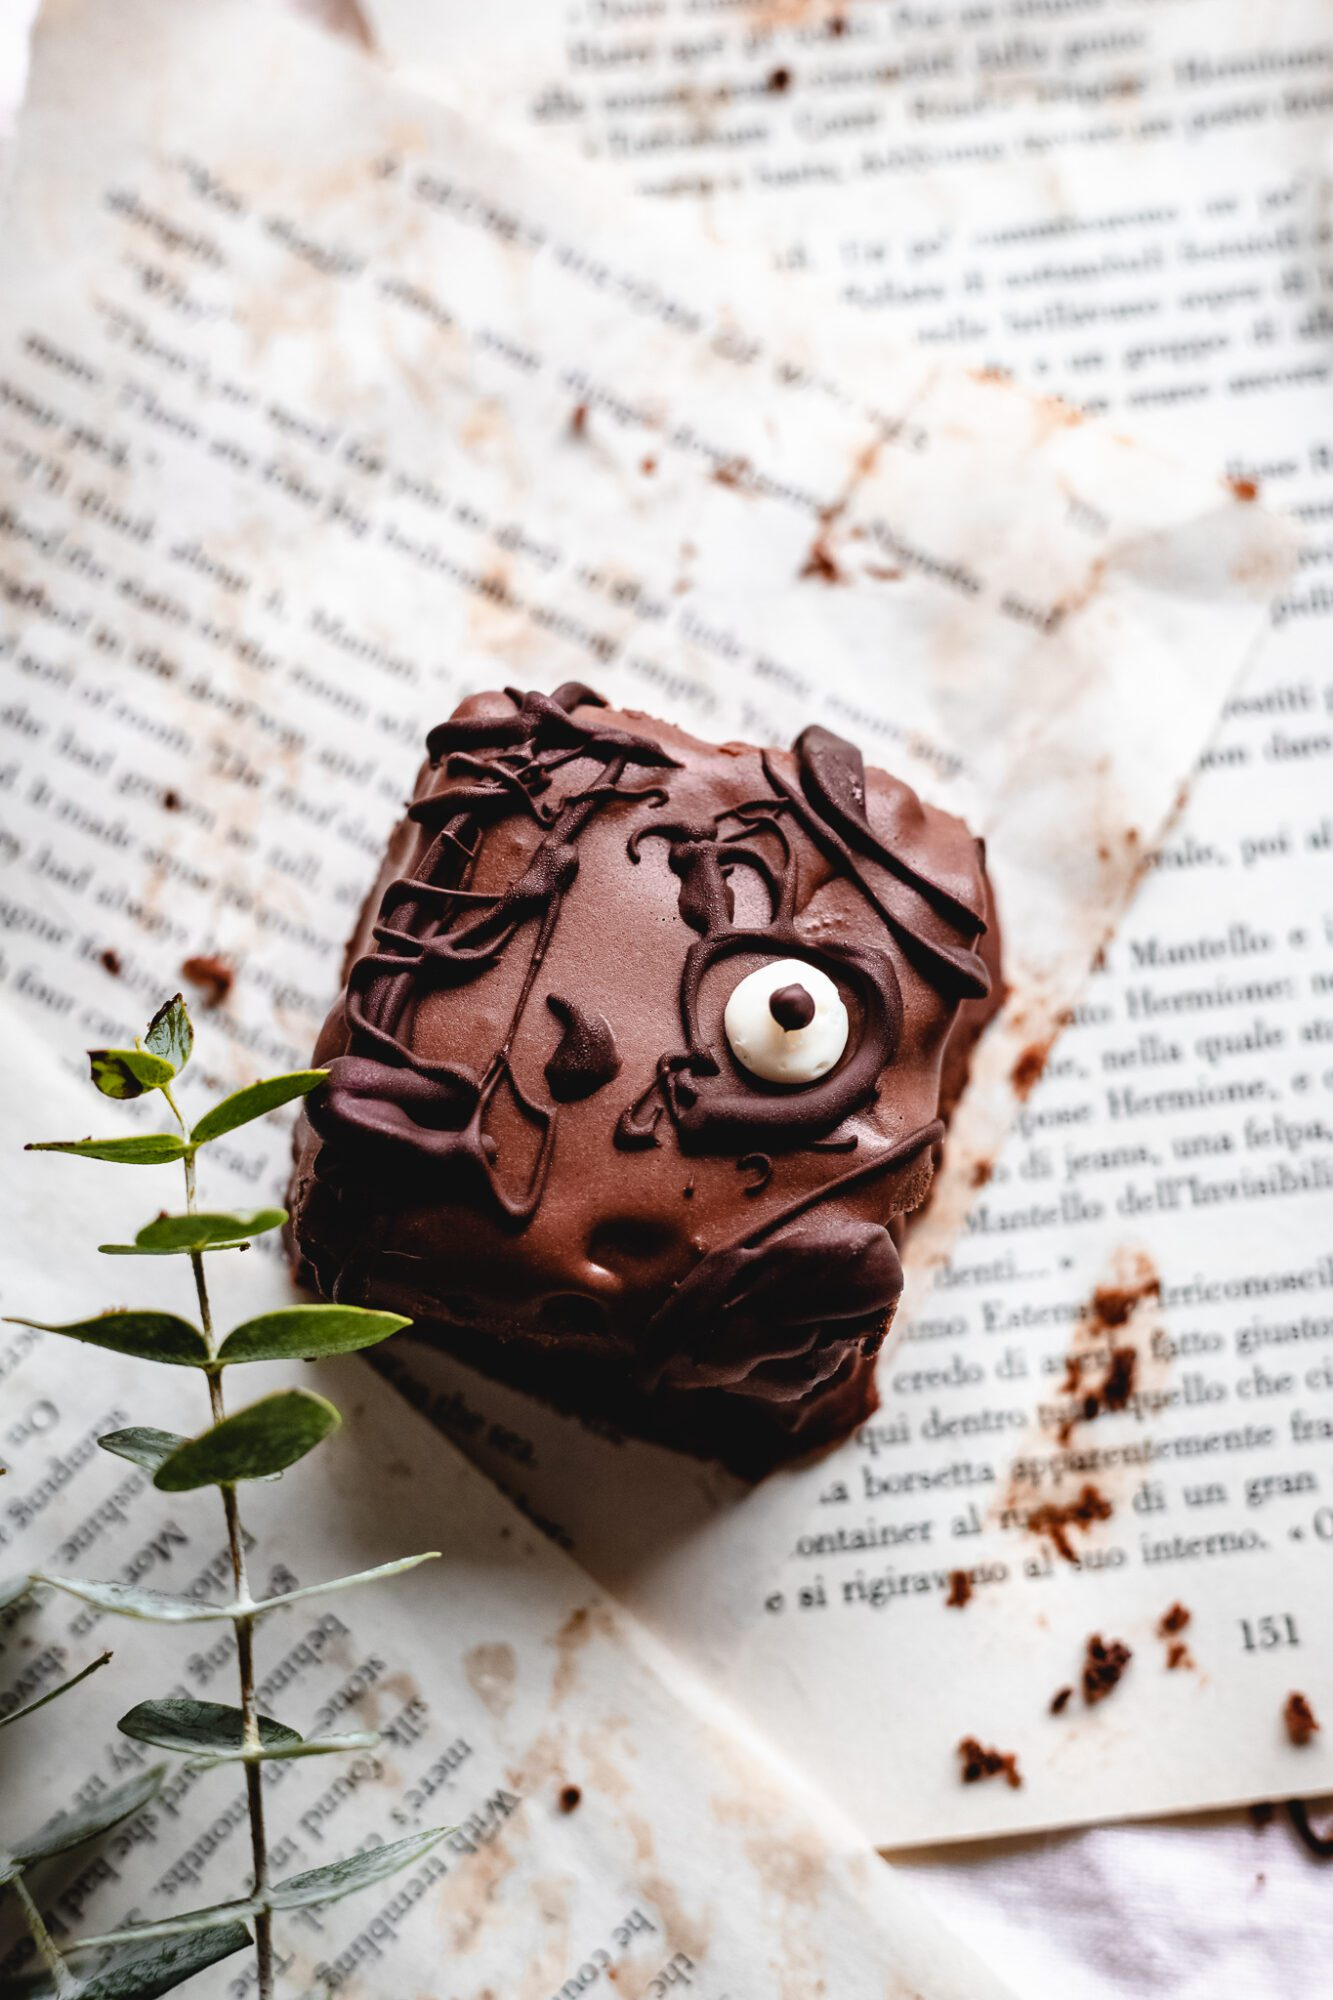 Vegan Hocus Pocus Spellbook Brownies The Banana Diaries